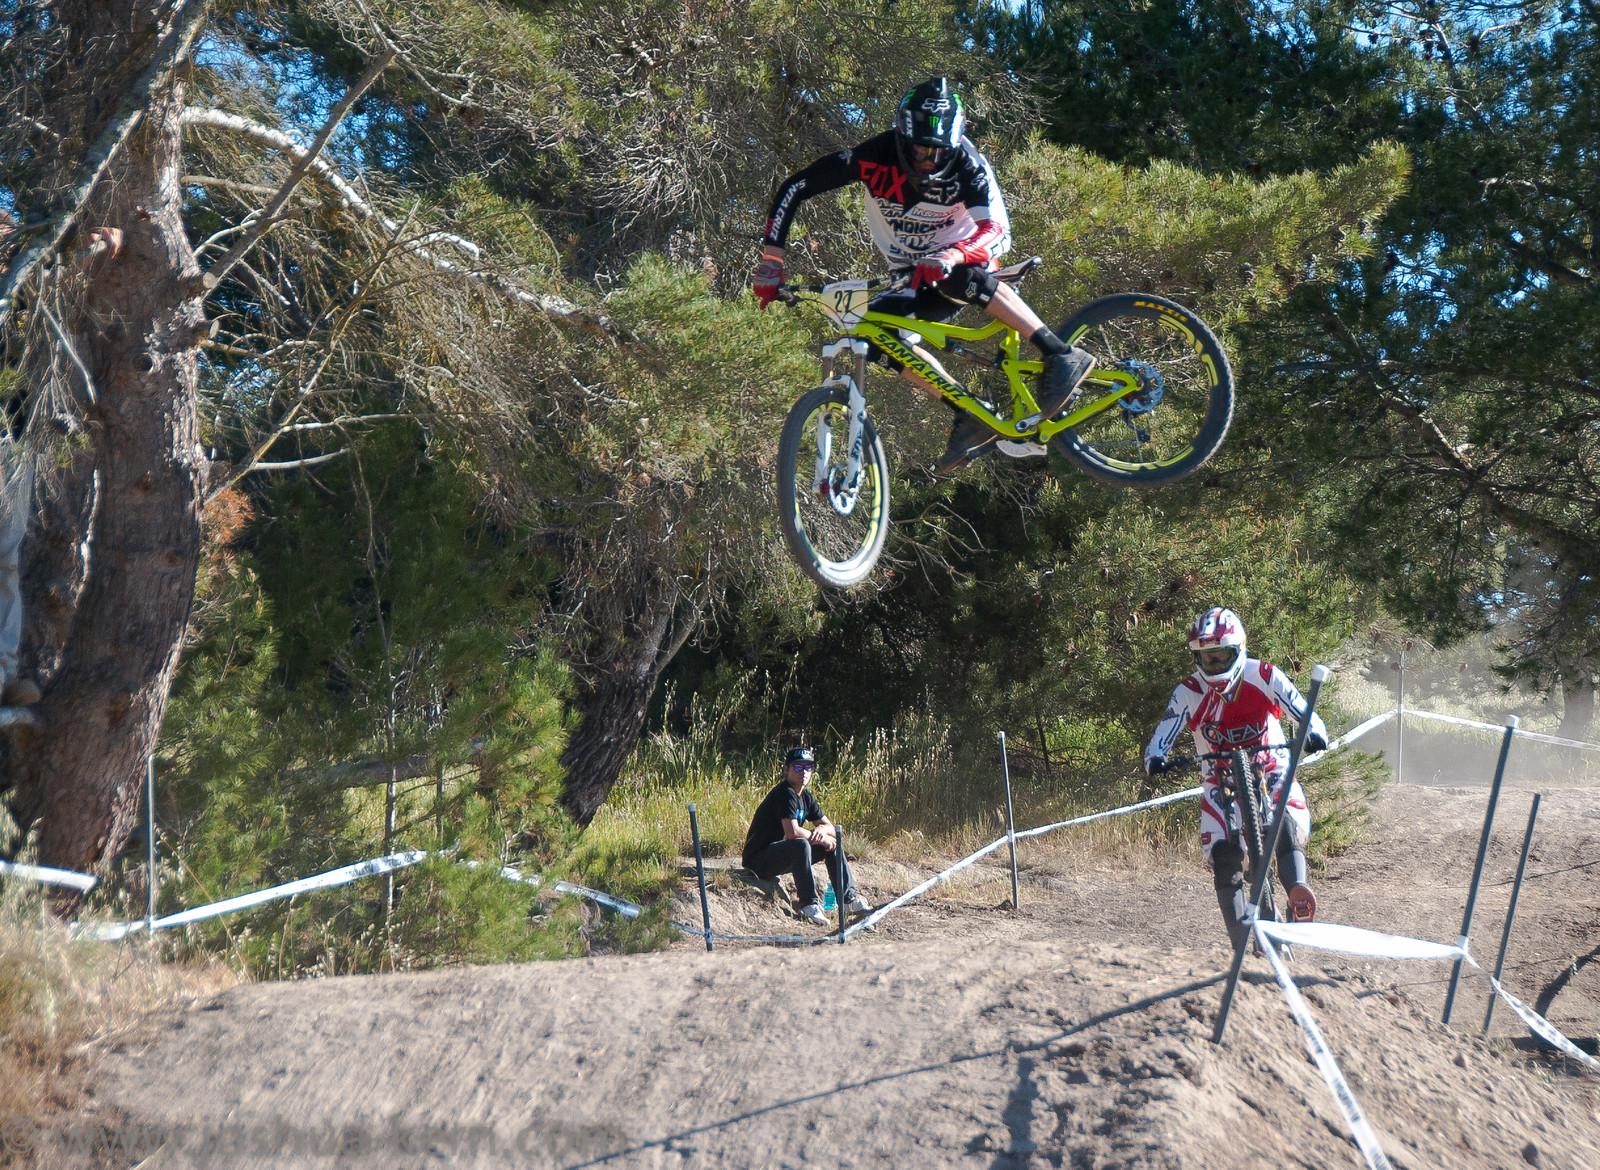 4-18-13DHPractice (2 of 17) - jkern620 - Mountain Biking Pictures - Vital MTB